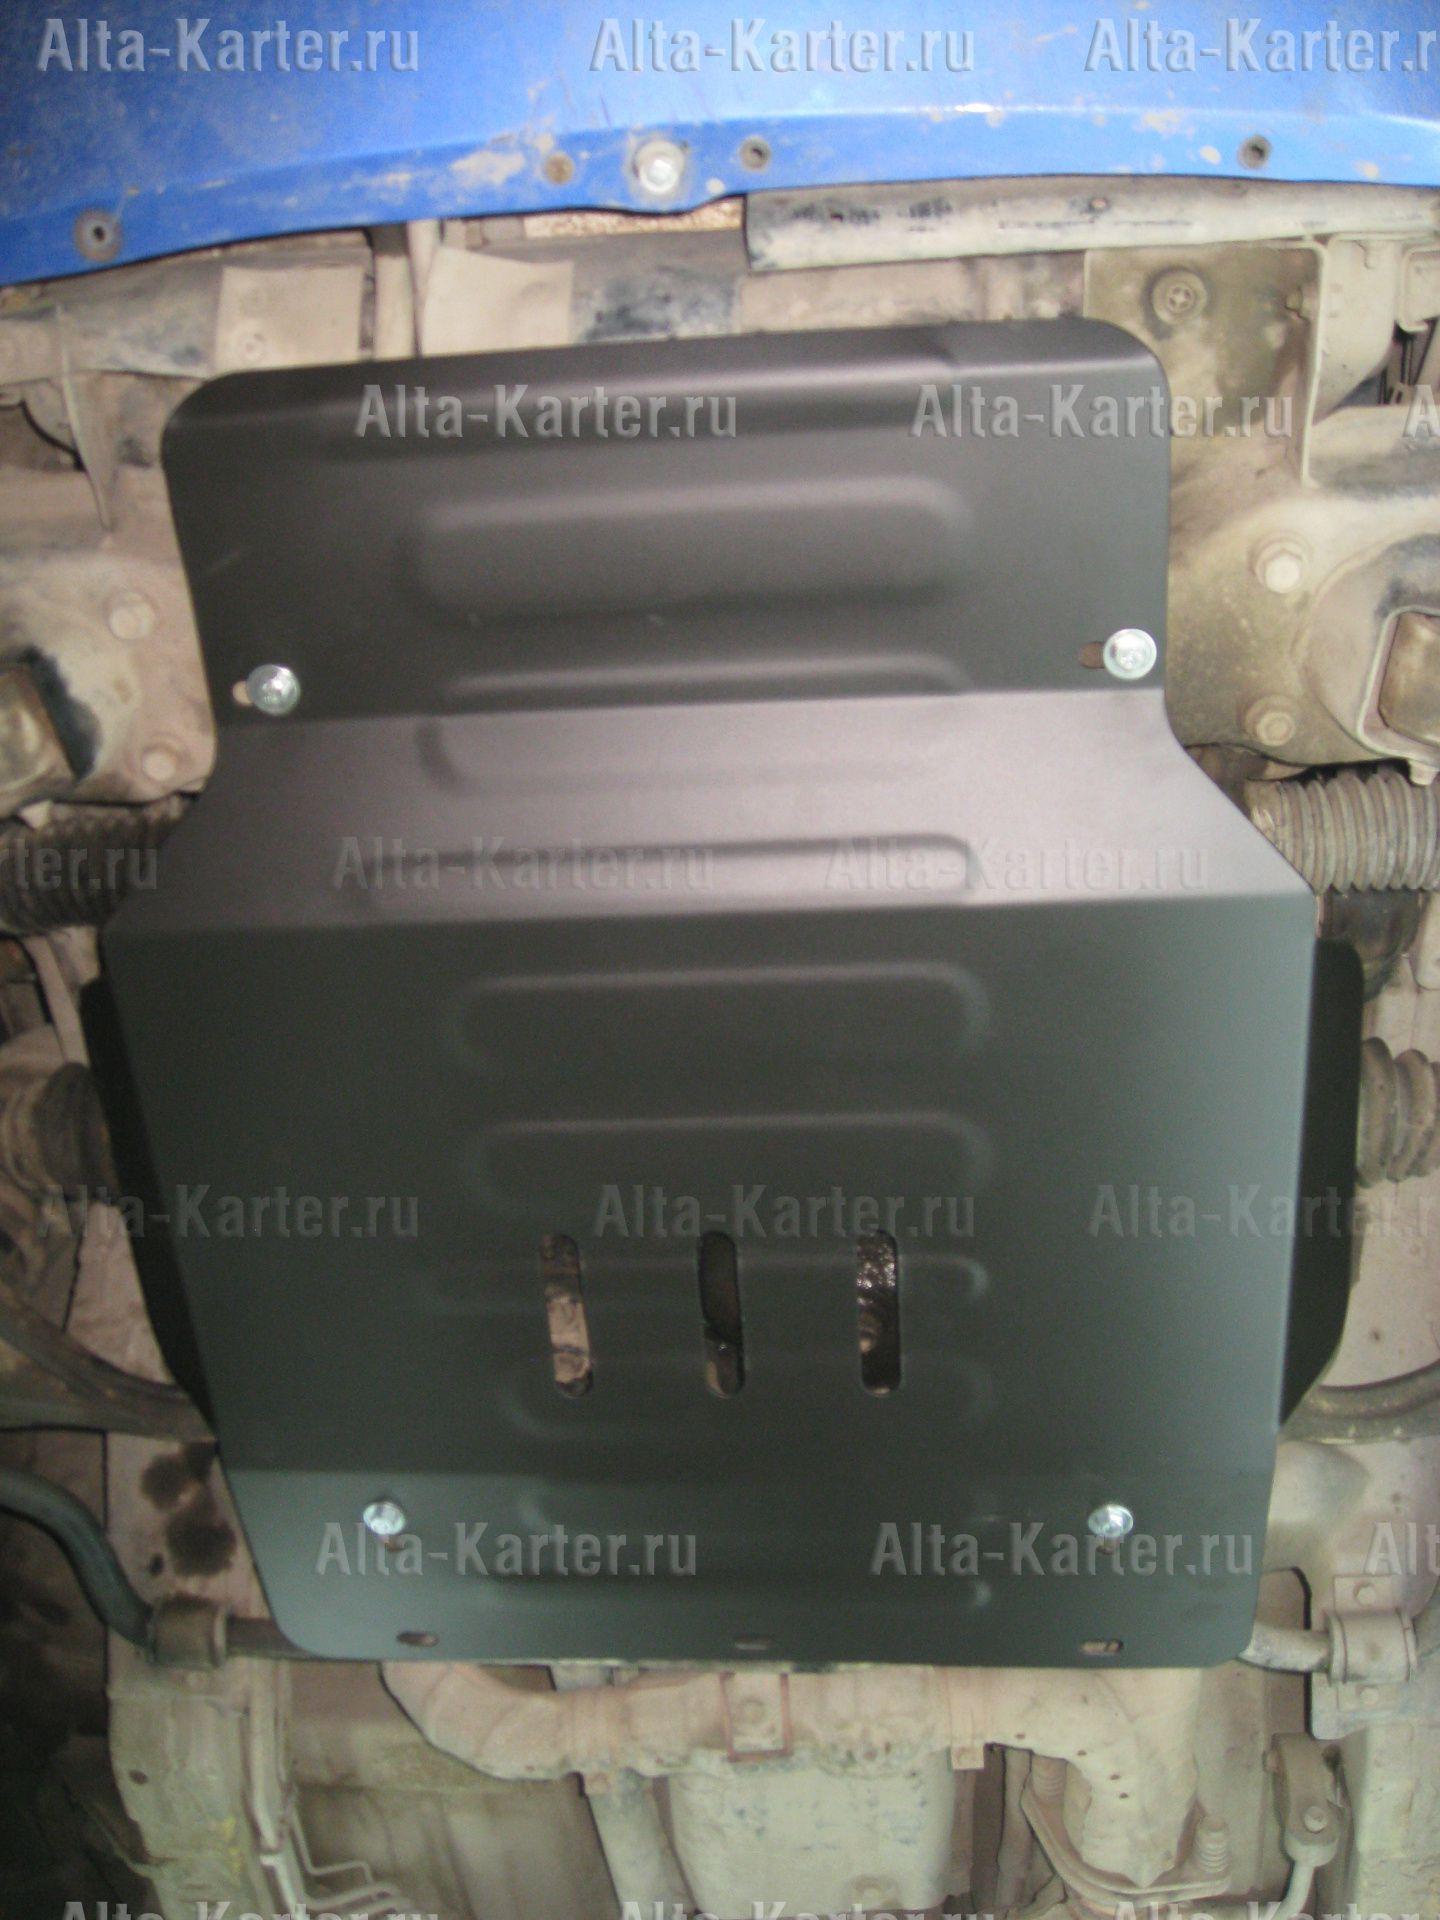 Защита Alfeco для картера Chevrolet Tracker 1998-2004. Артикул ALF.23.12